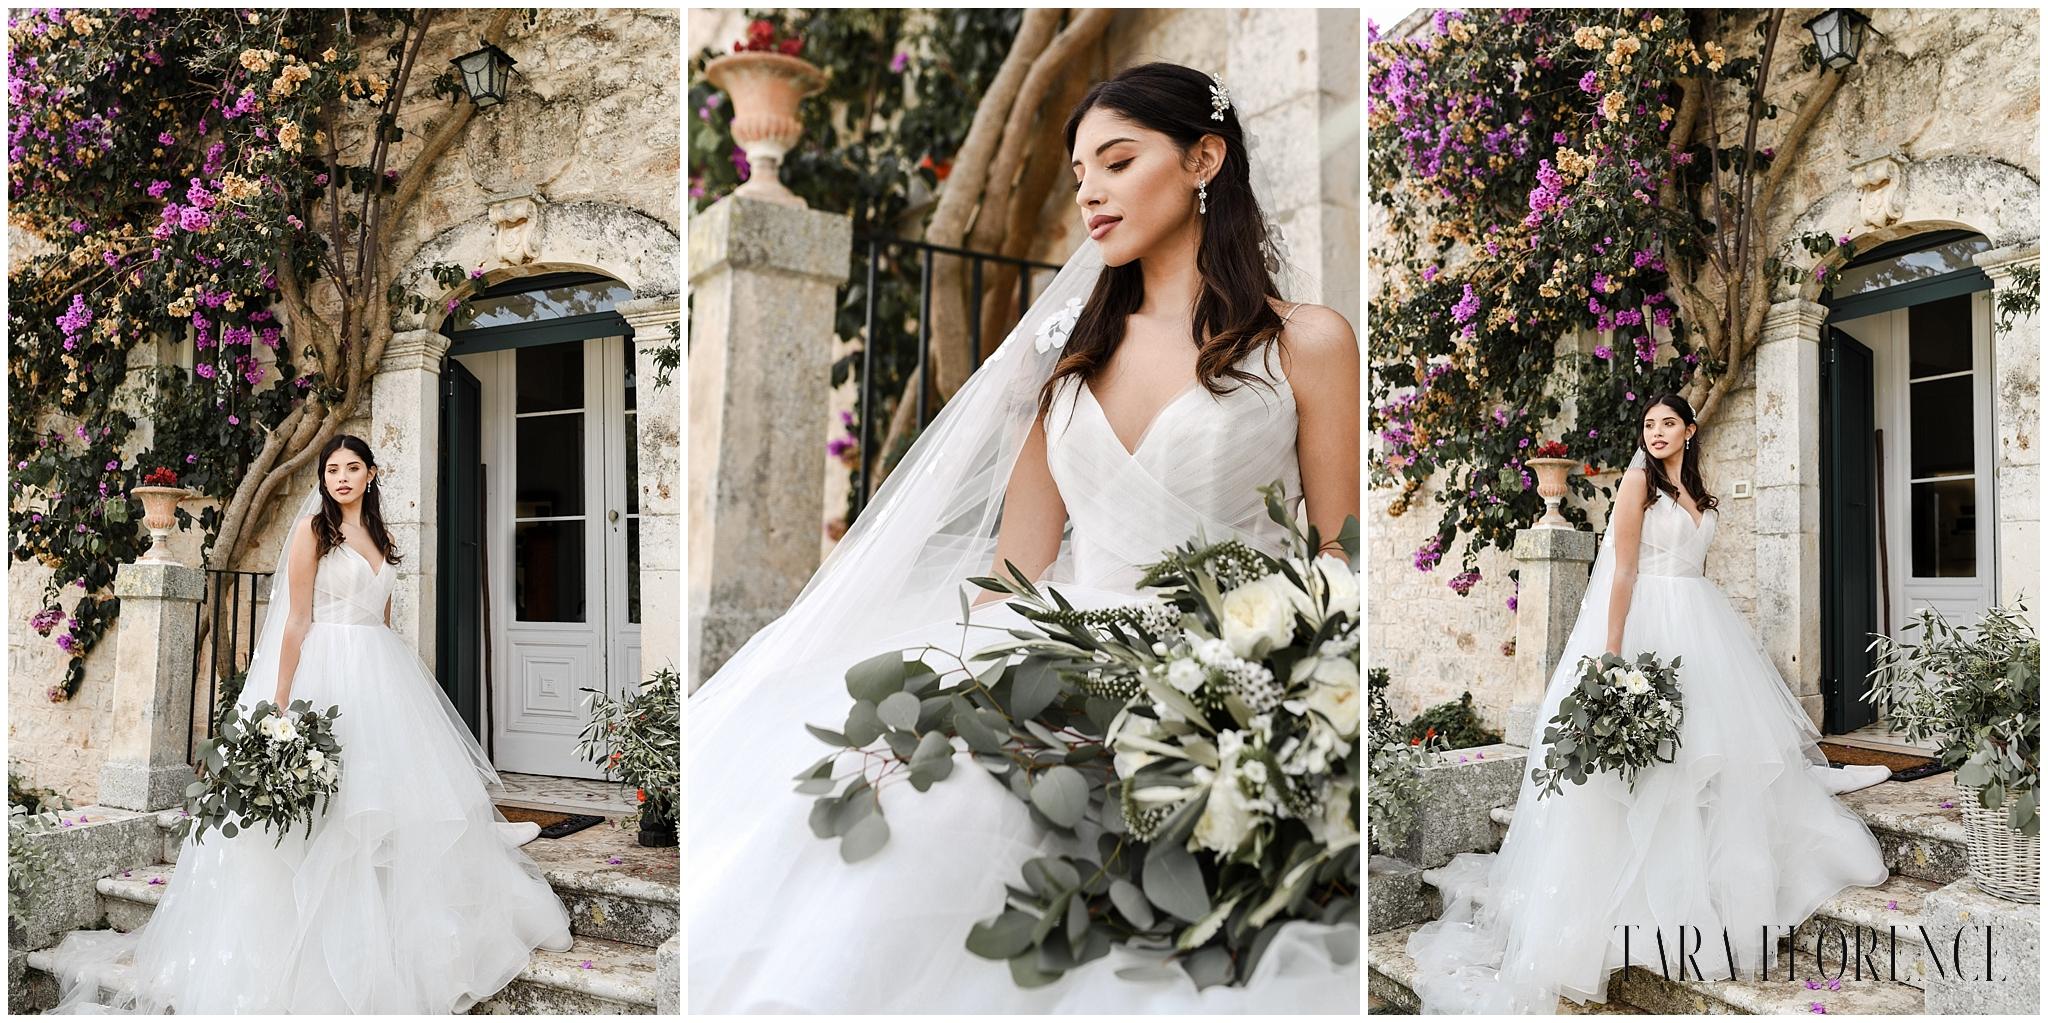 Puglia-Tara-Florence-Bridal-Editorial-133_WEB.jpg